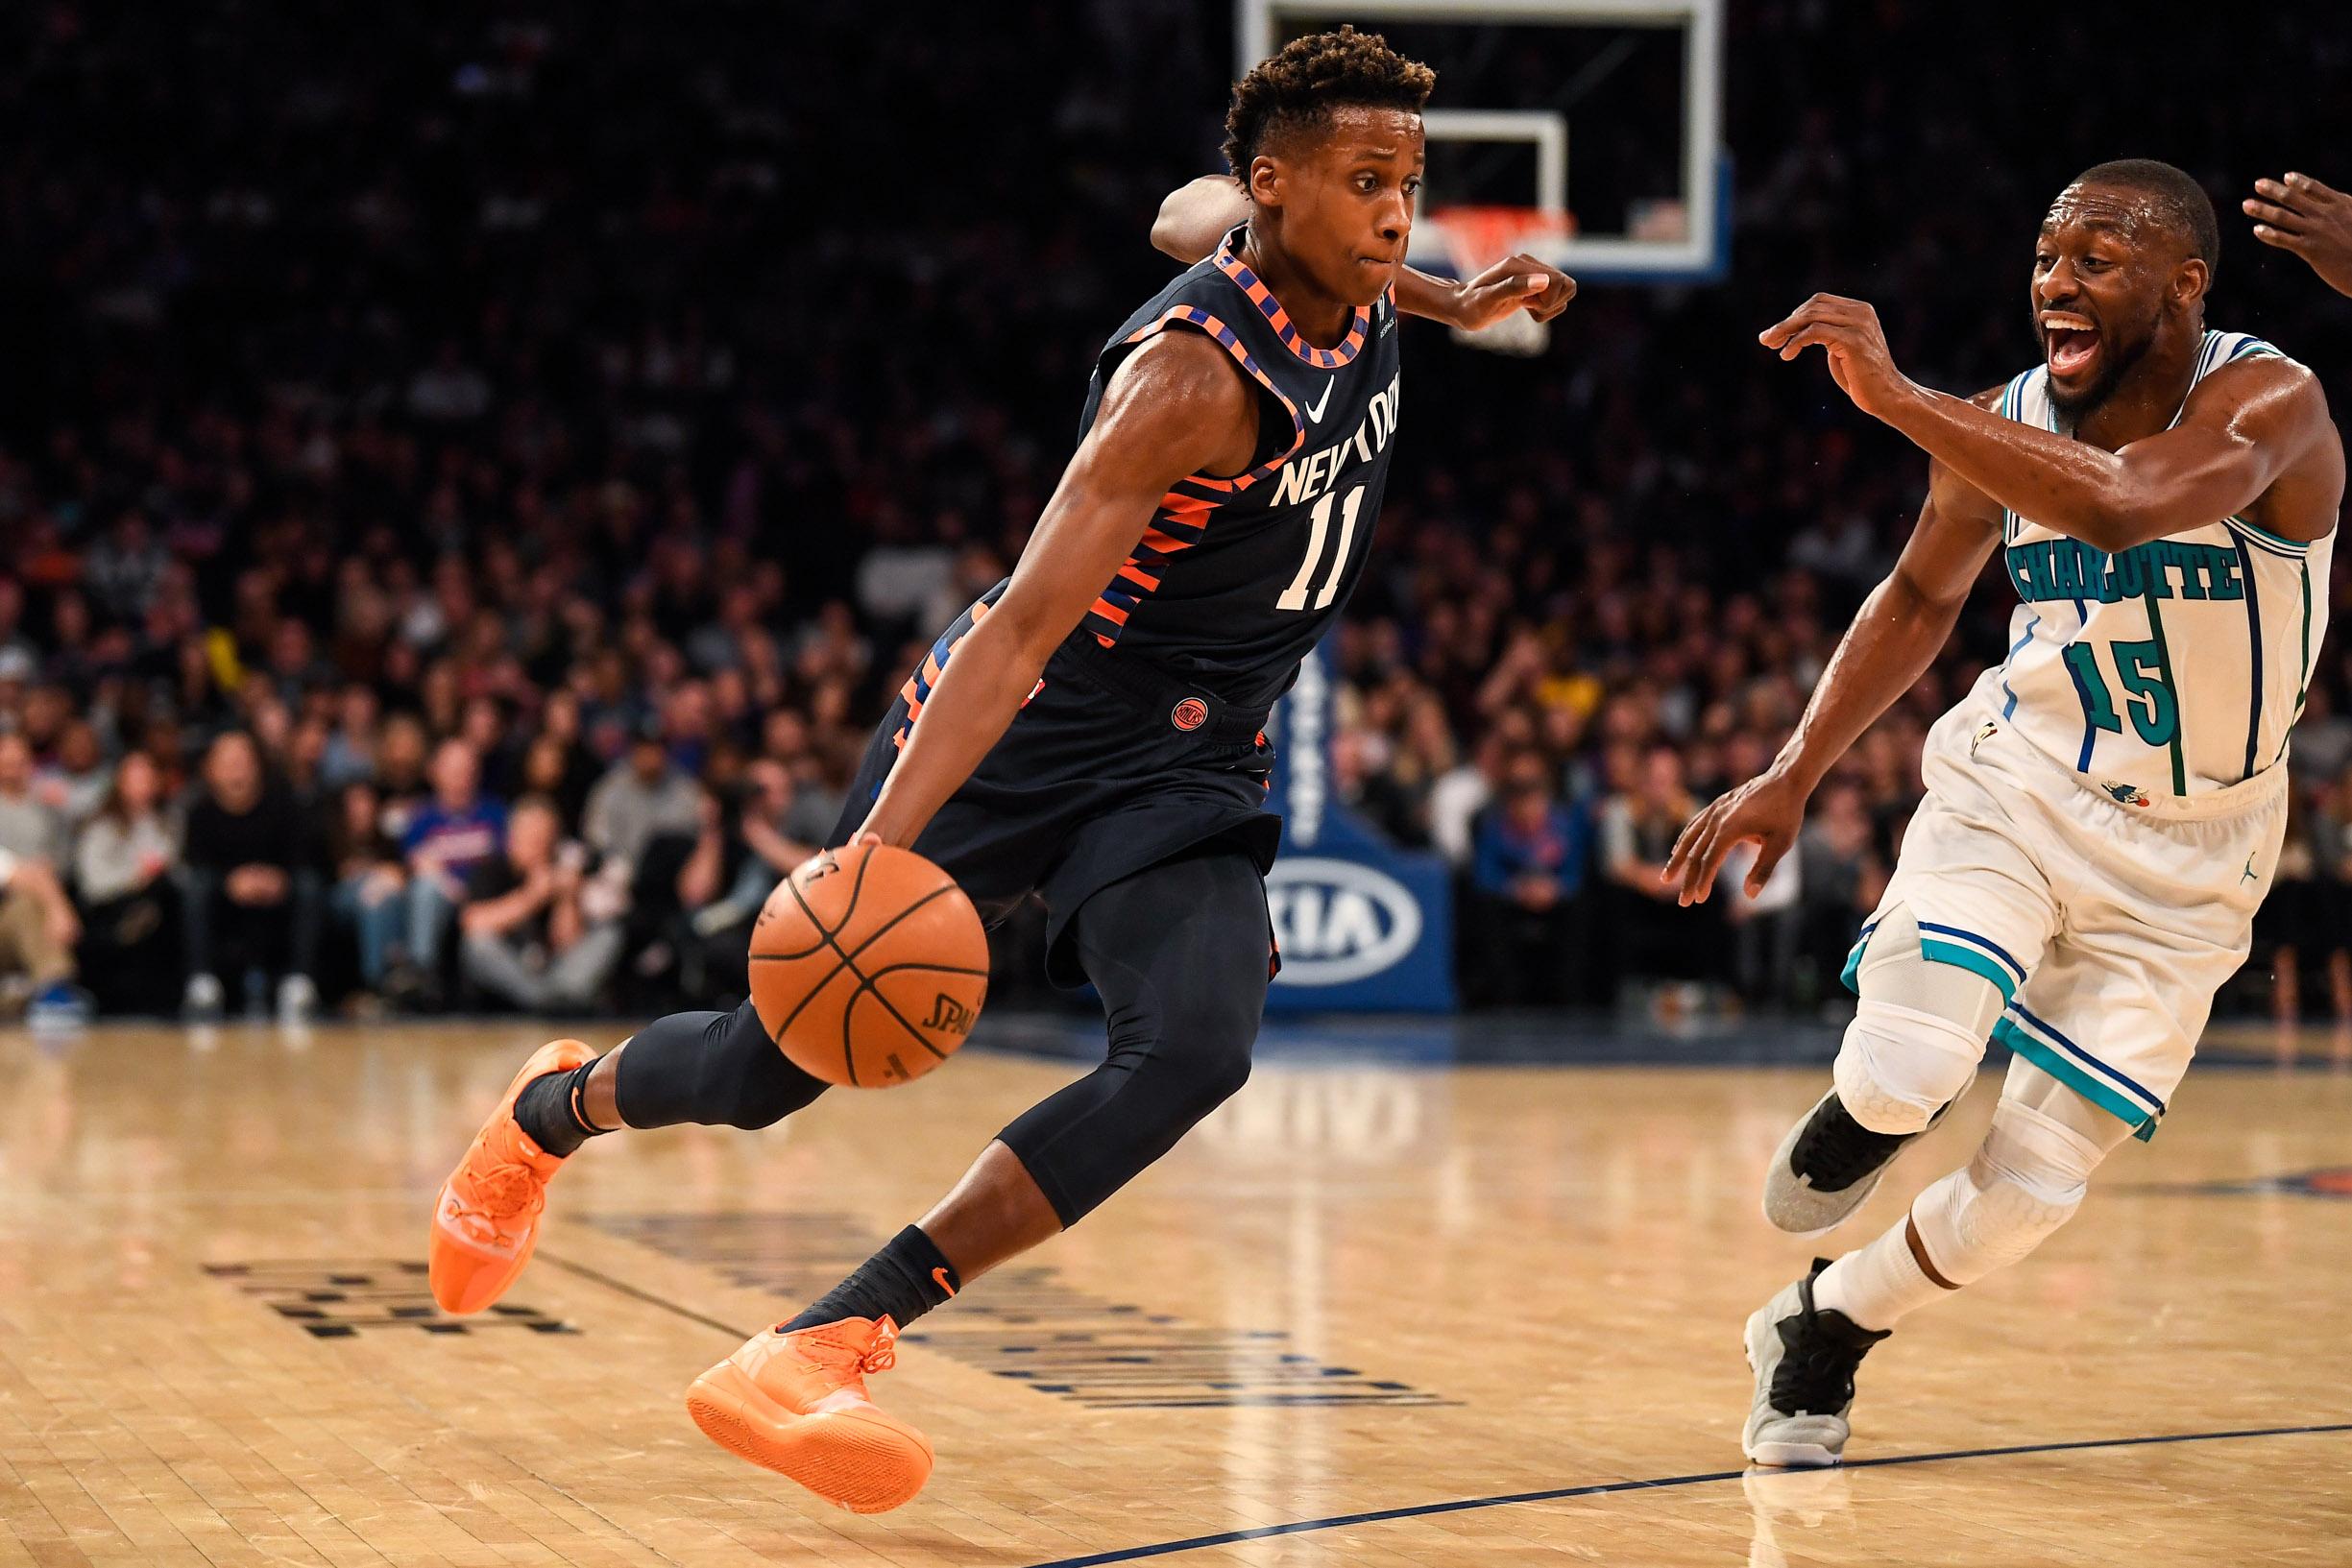 Infos sports en direct : Basket - </b>NBA - Ntilikina : </b>&#171;Le vrai Frank arrive&#187;